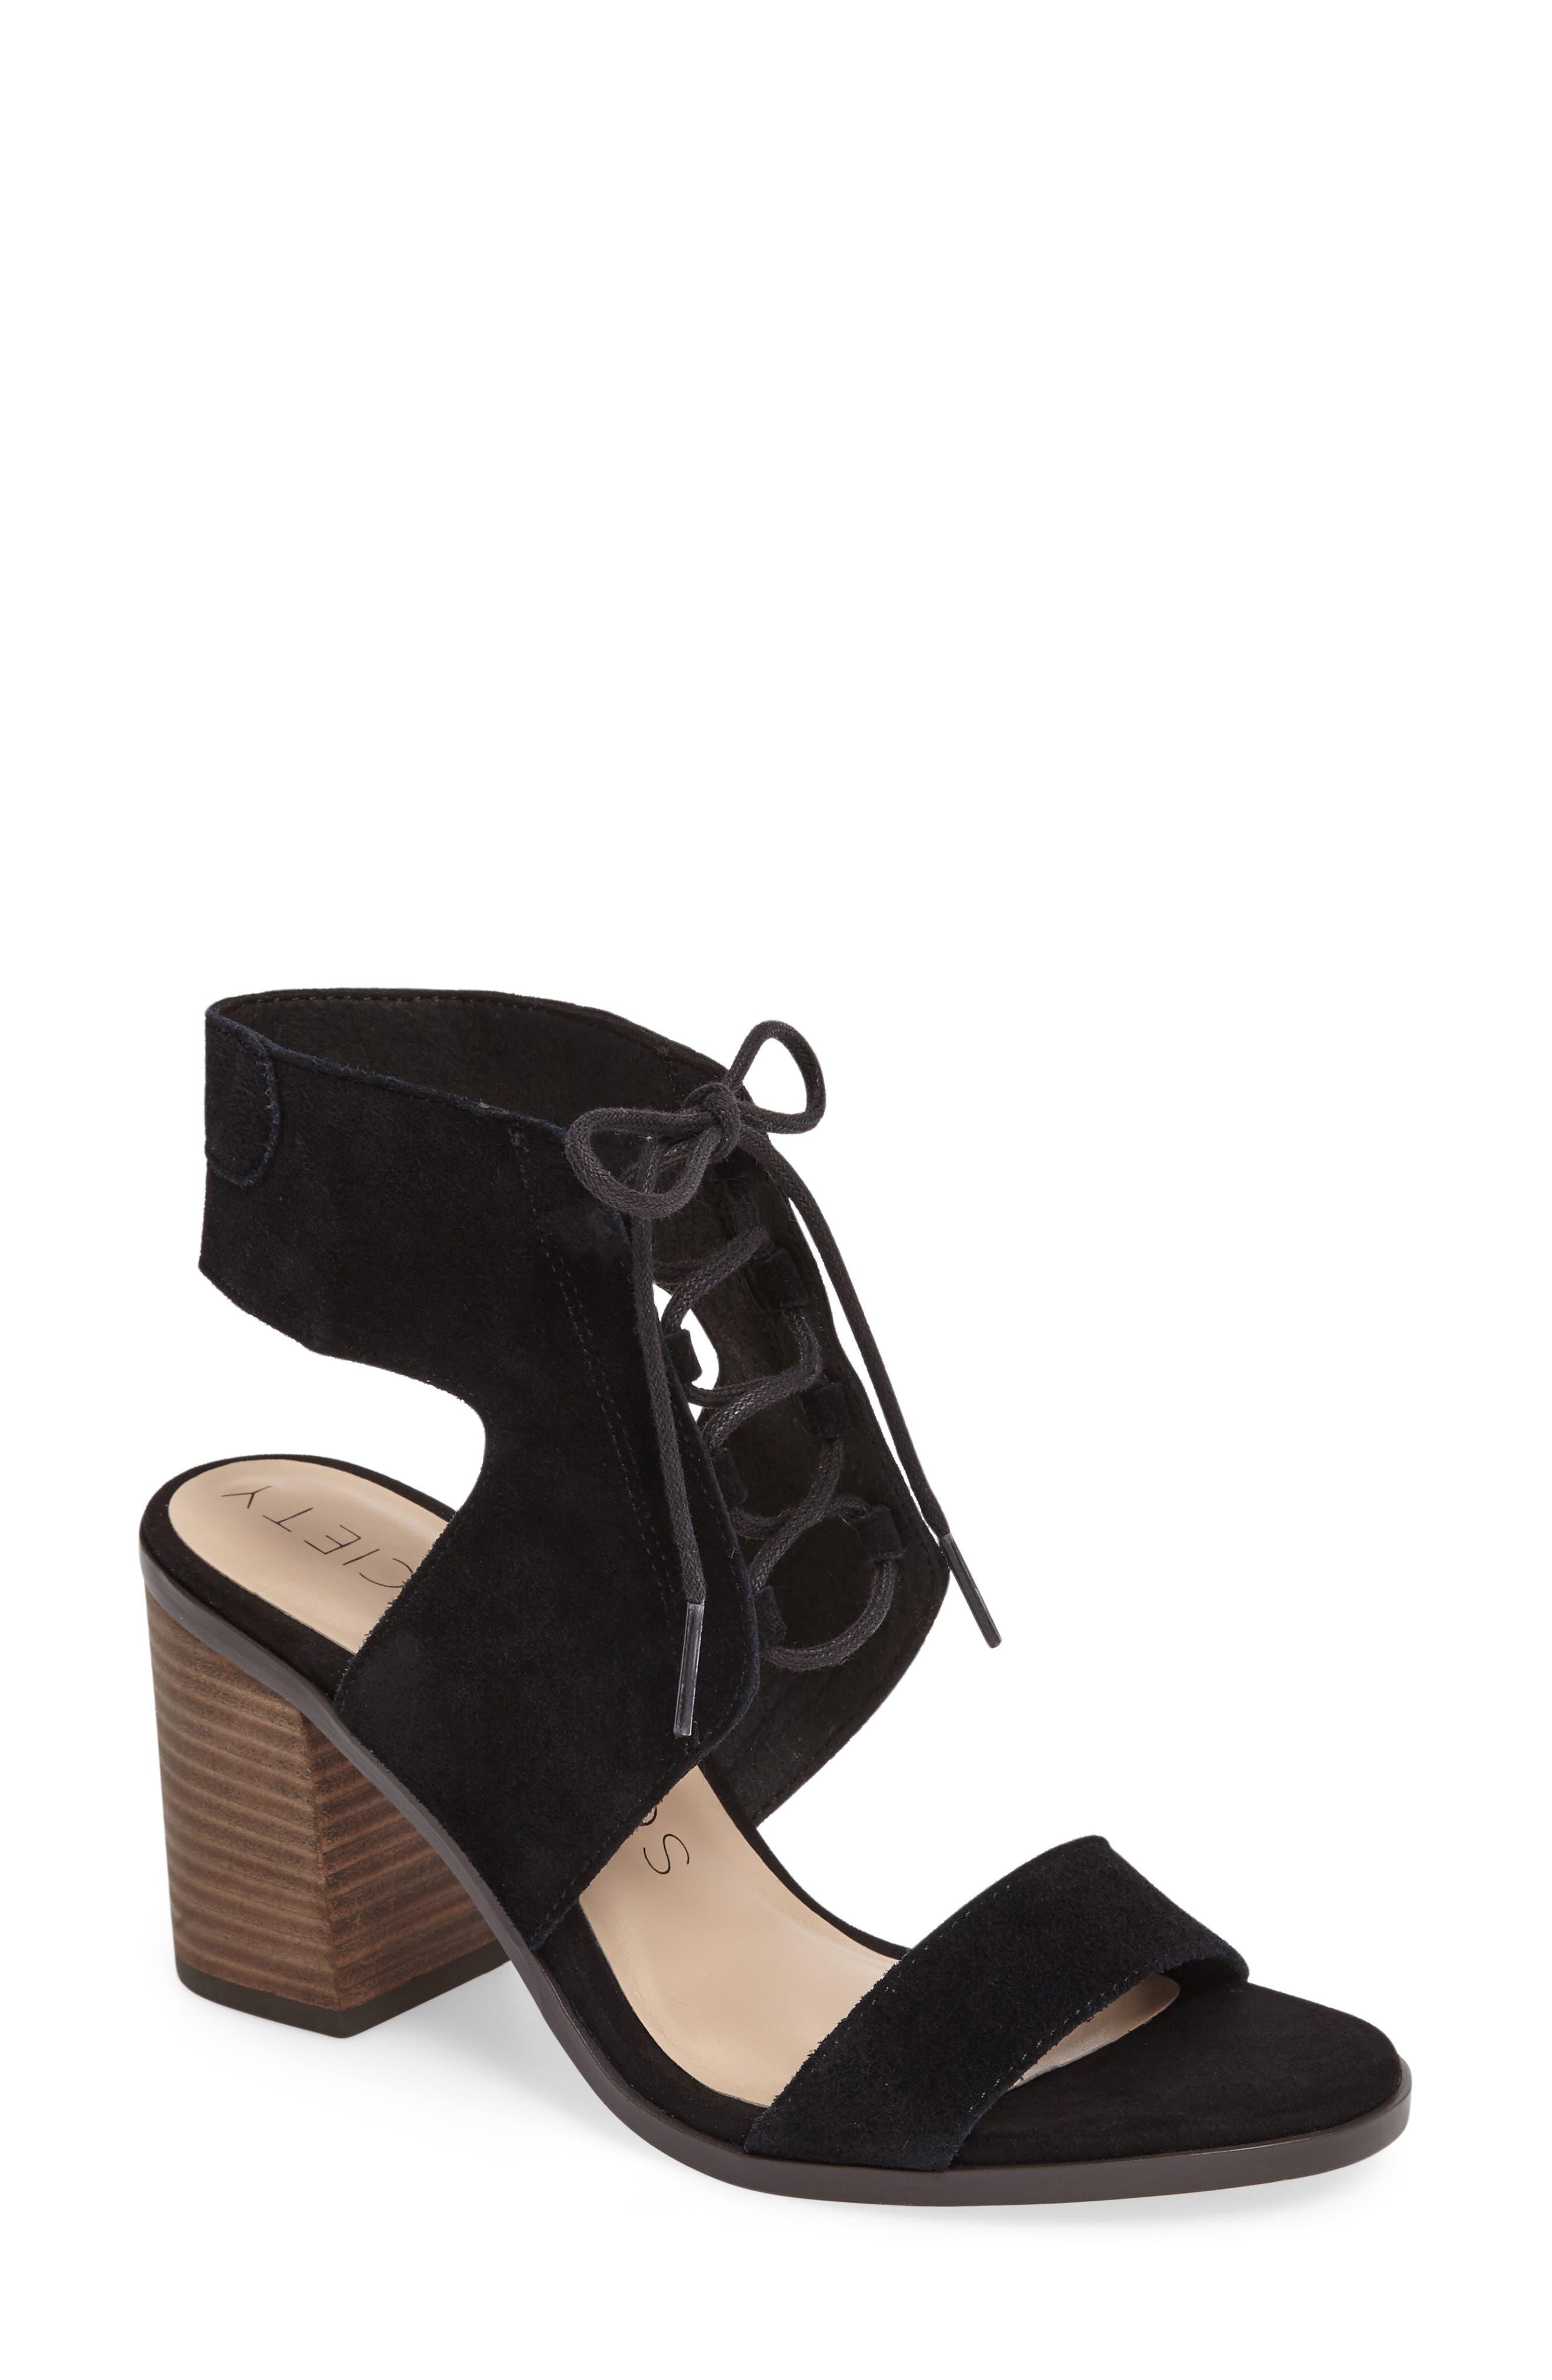 Alternate Image 1 Selected - Sole Society Auburn Lace-Up Sandal (Women)